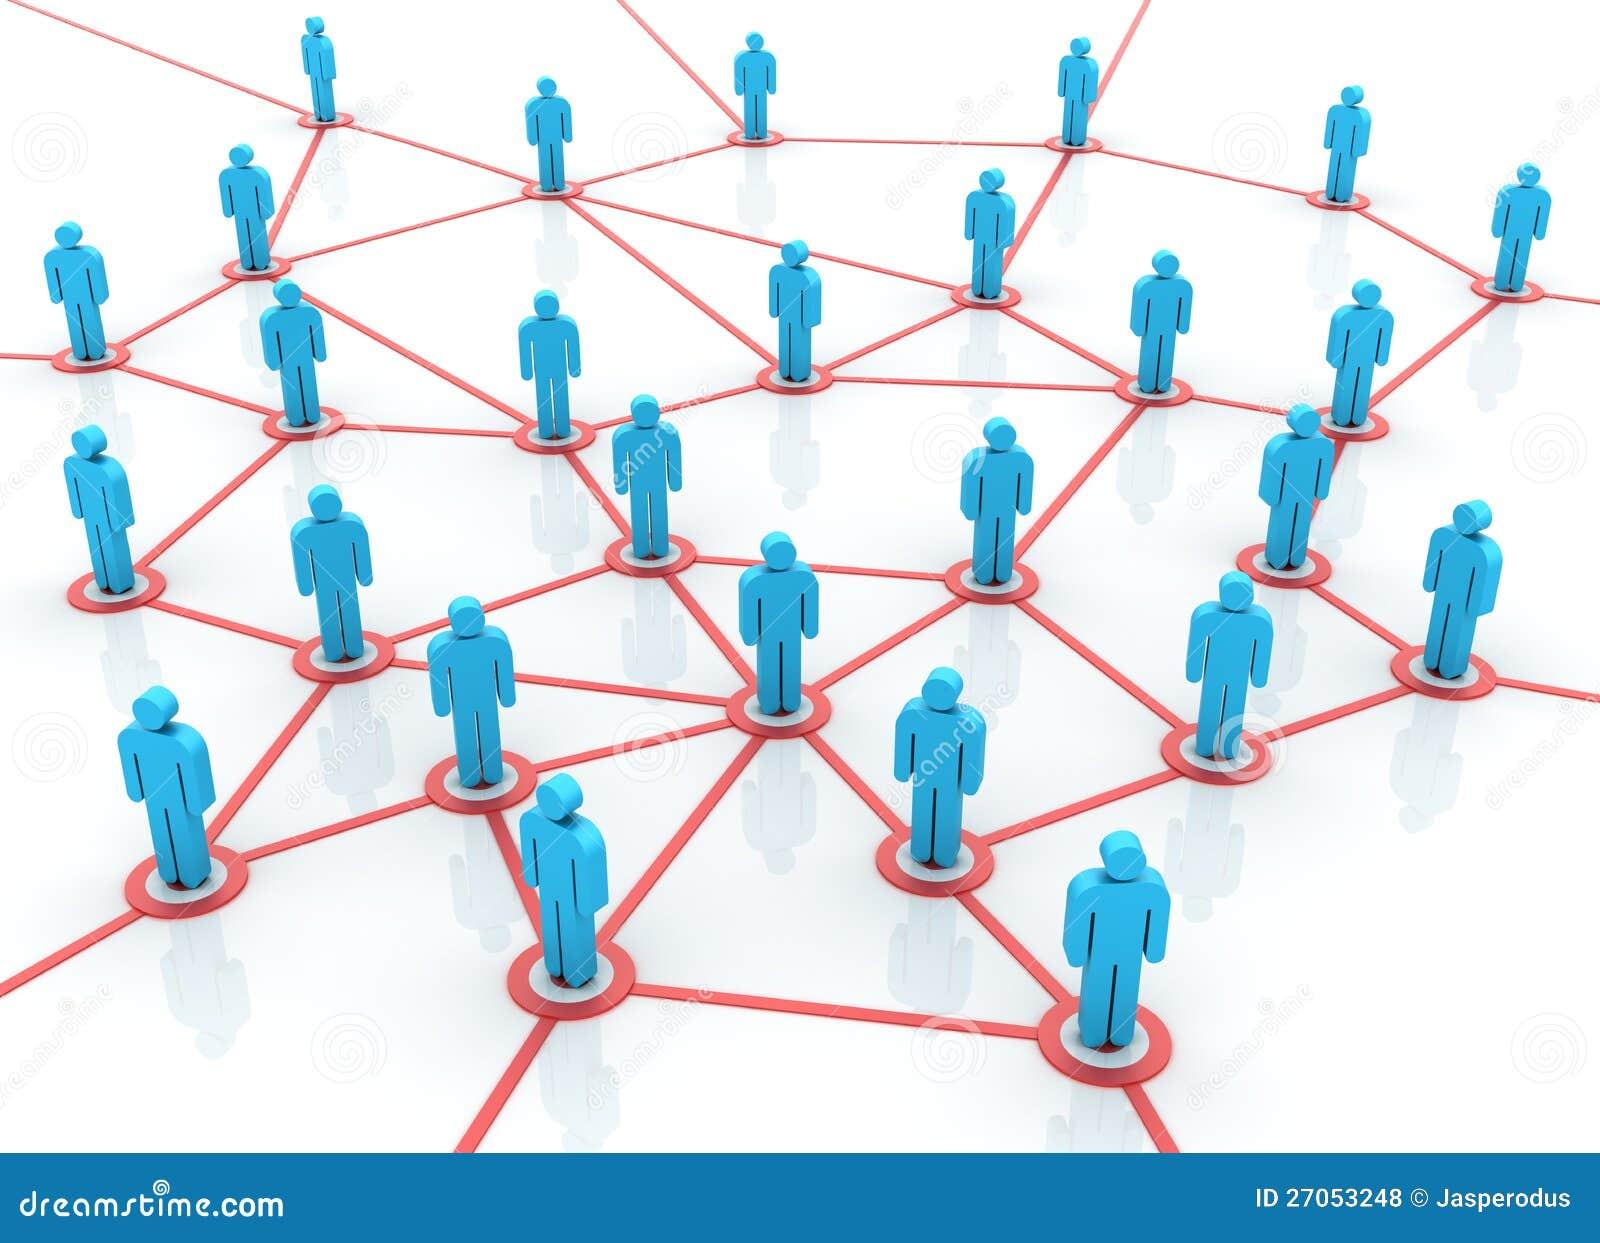 Teamwork - Network